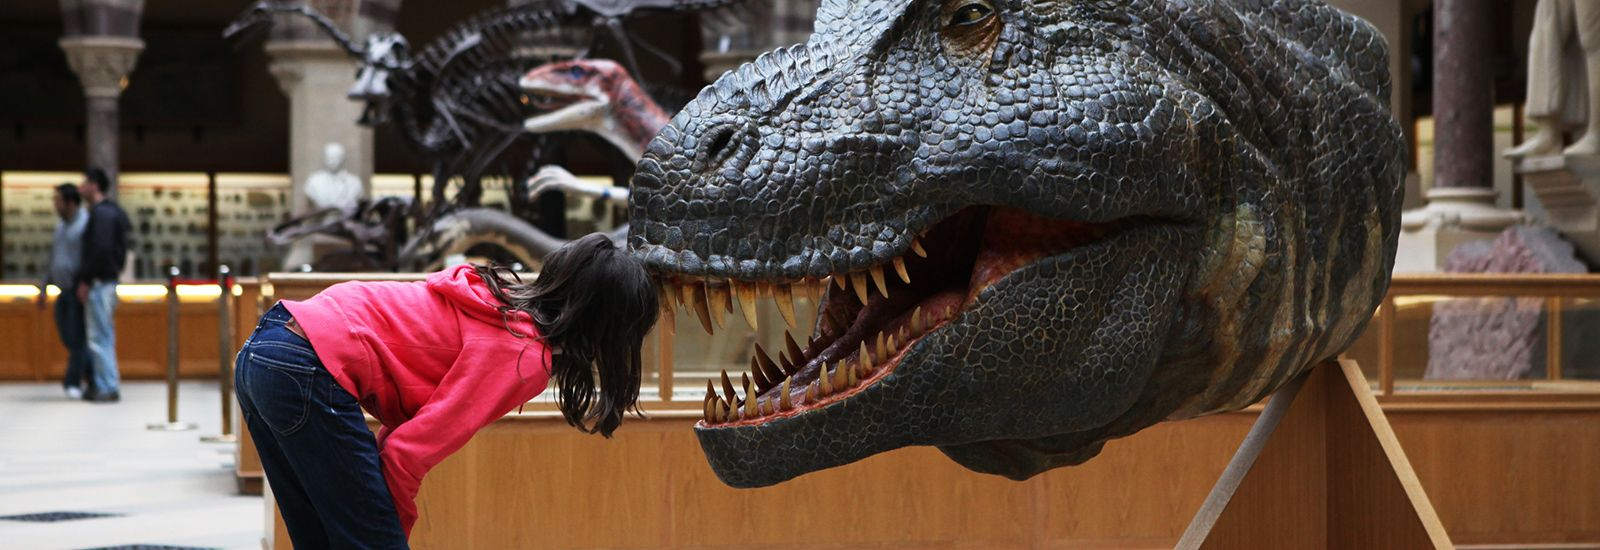 Girl looking at exhibits at Oxford University Museum of Natural History